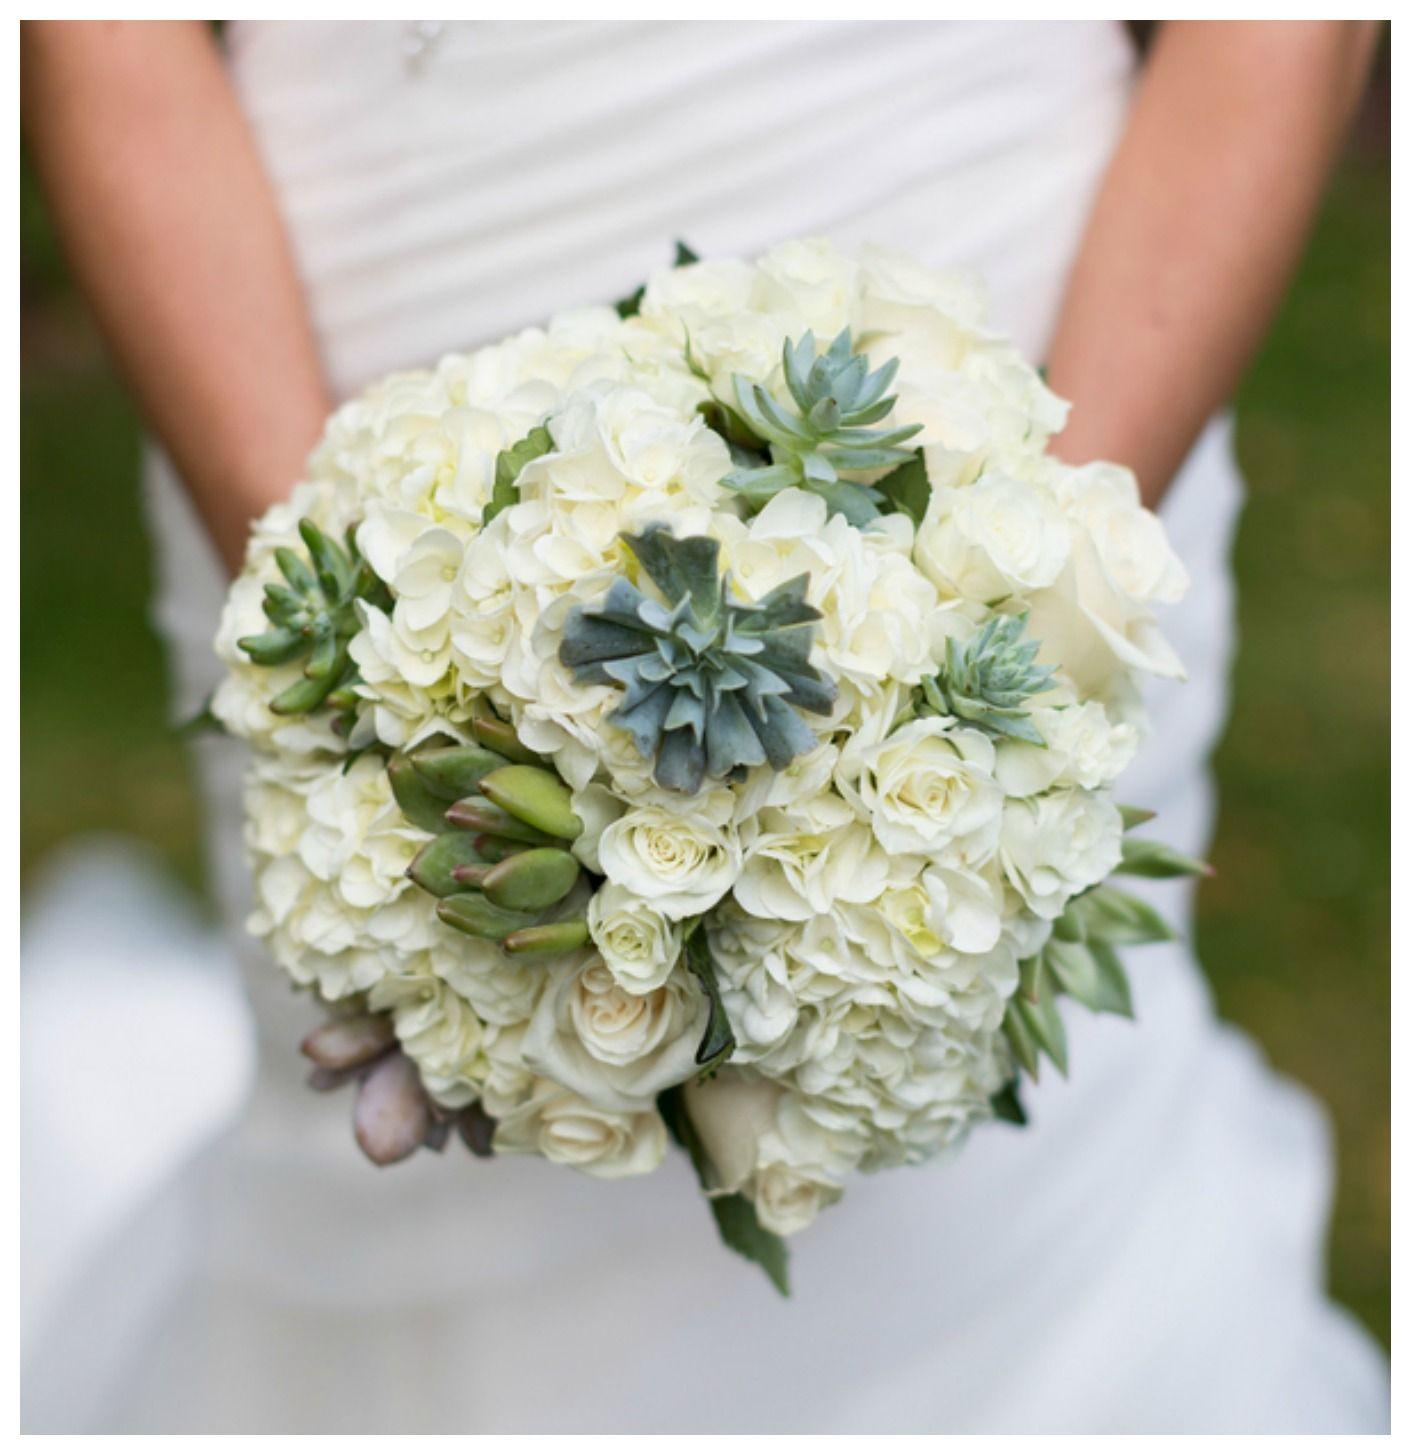 Rustic Maine Coastline Wedding Hydrangea bouquet wedding